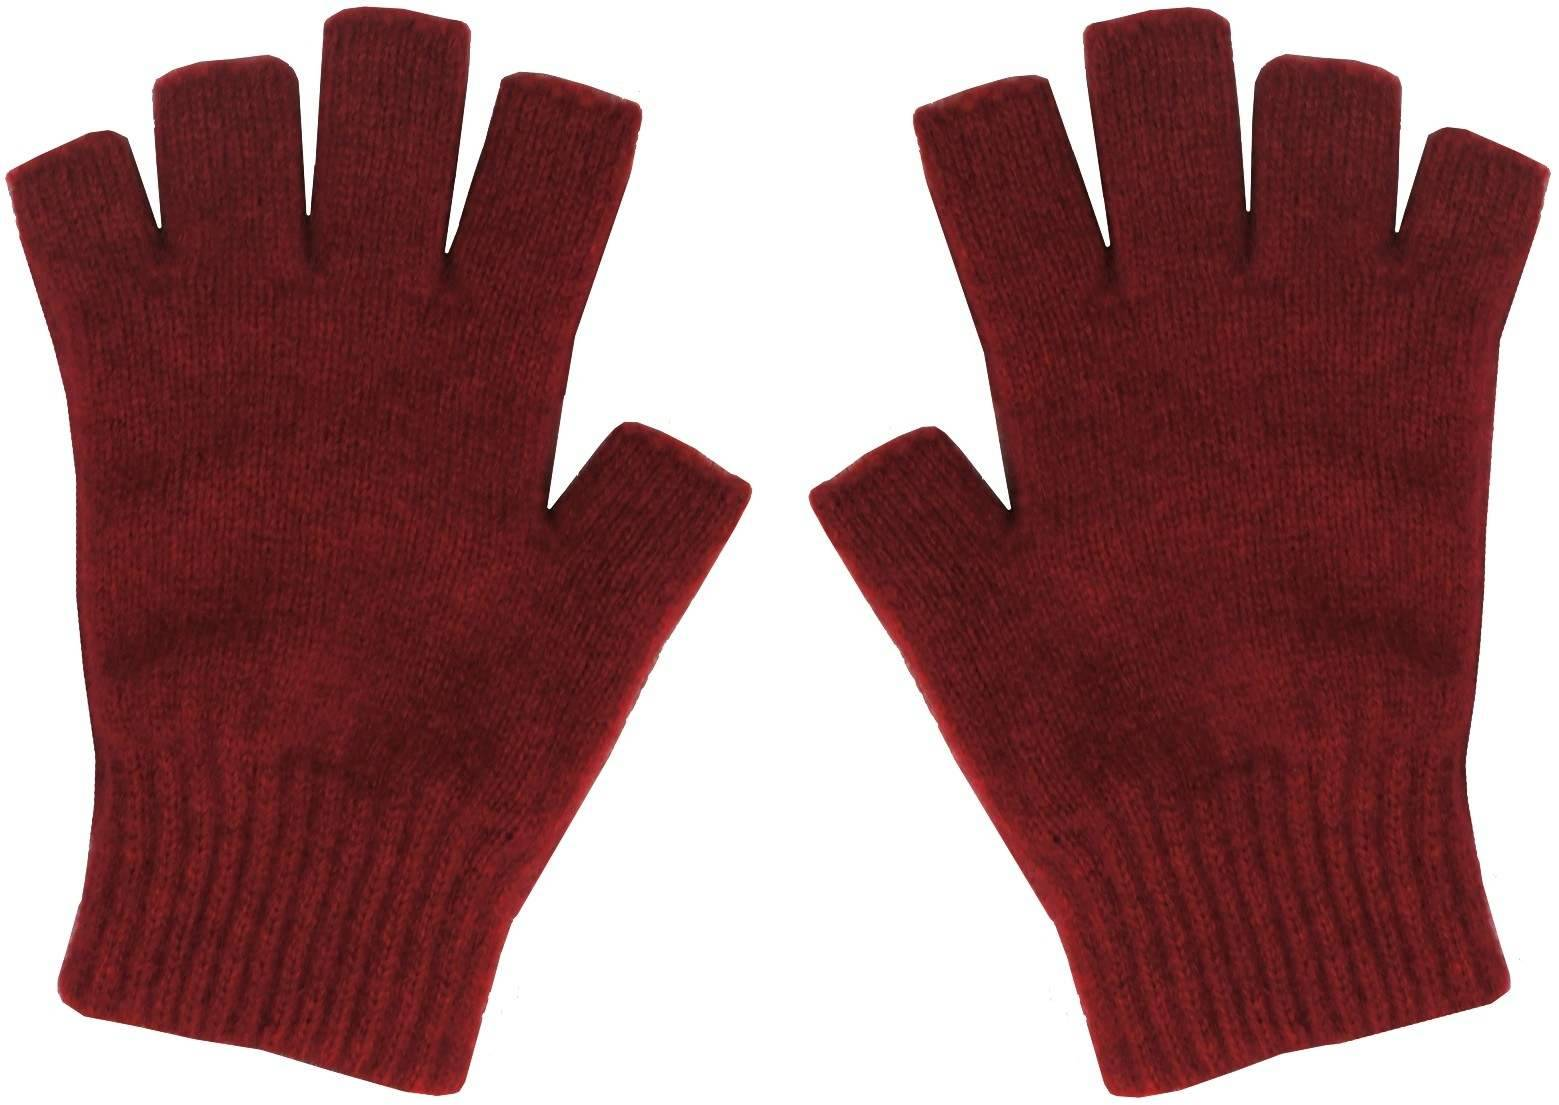 Buy Possum Merino Fingerless Gloves Medium Afterpay Zippay The Knit Hoodie Maroon